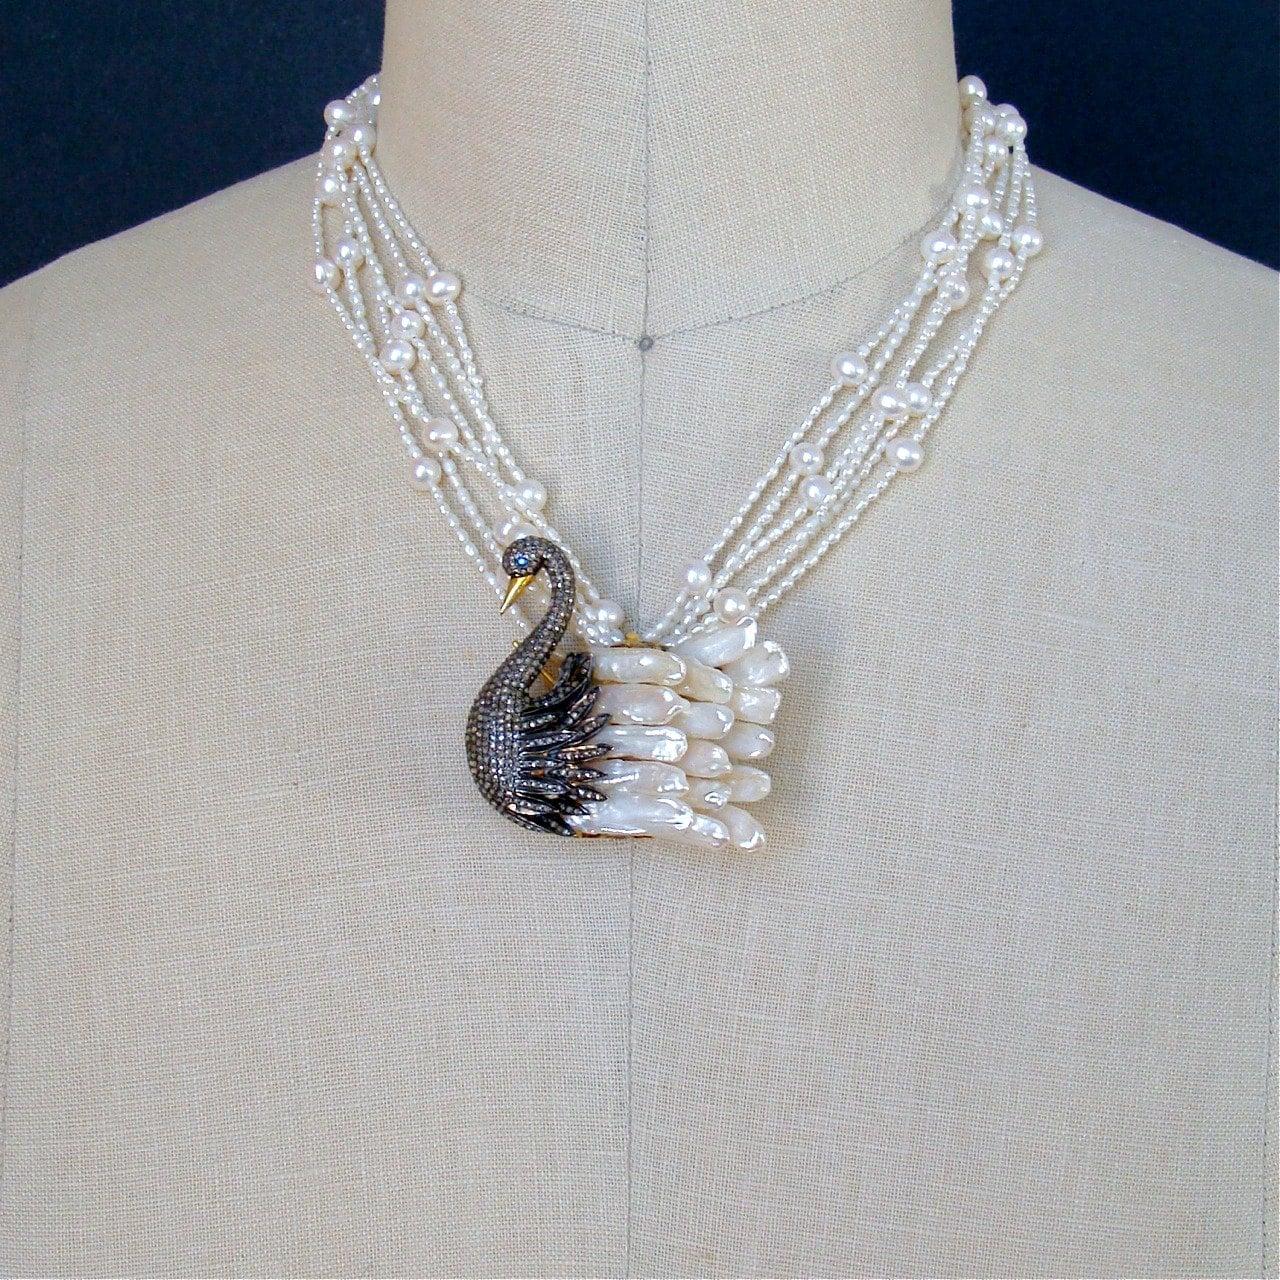 Torsade Necklace: Freshwater Pearls Diamond Swan Pendant Torsade Necklace